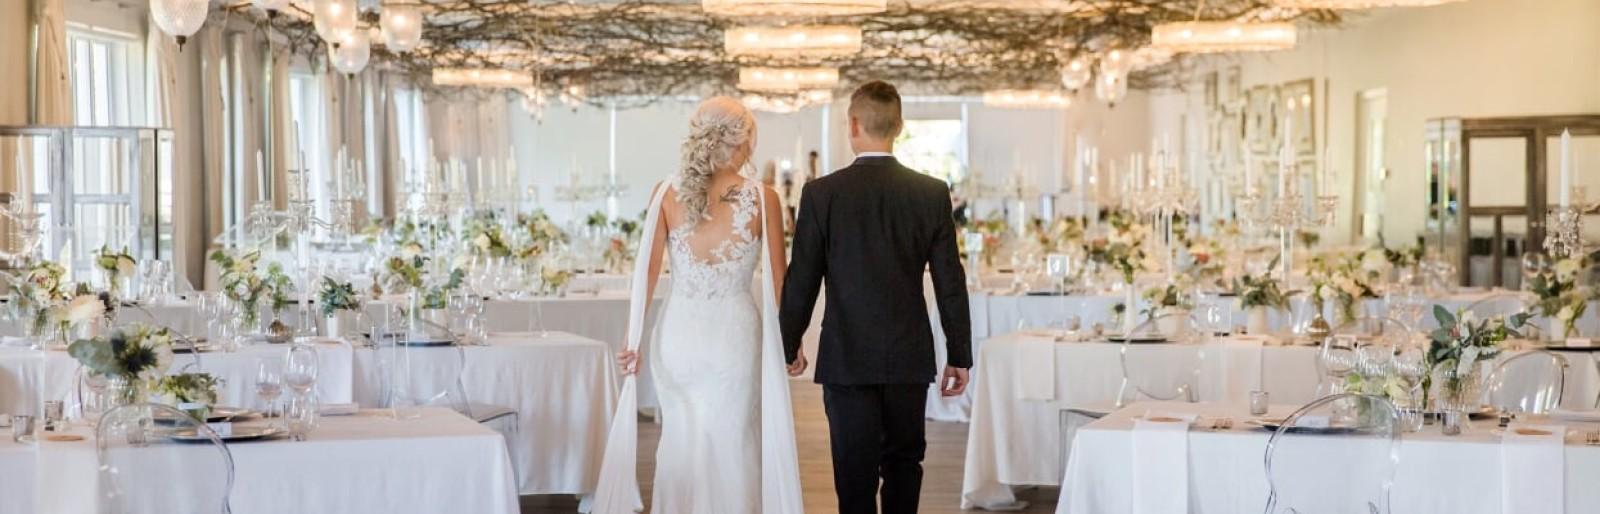 Bona Dea Midweek Wedding Special